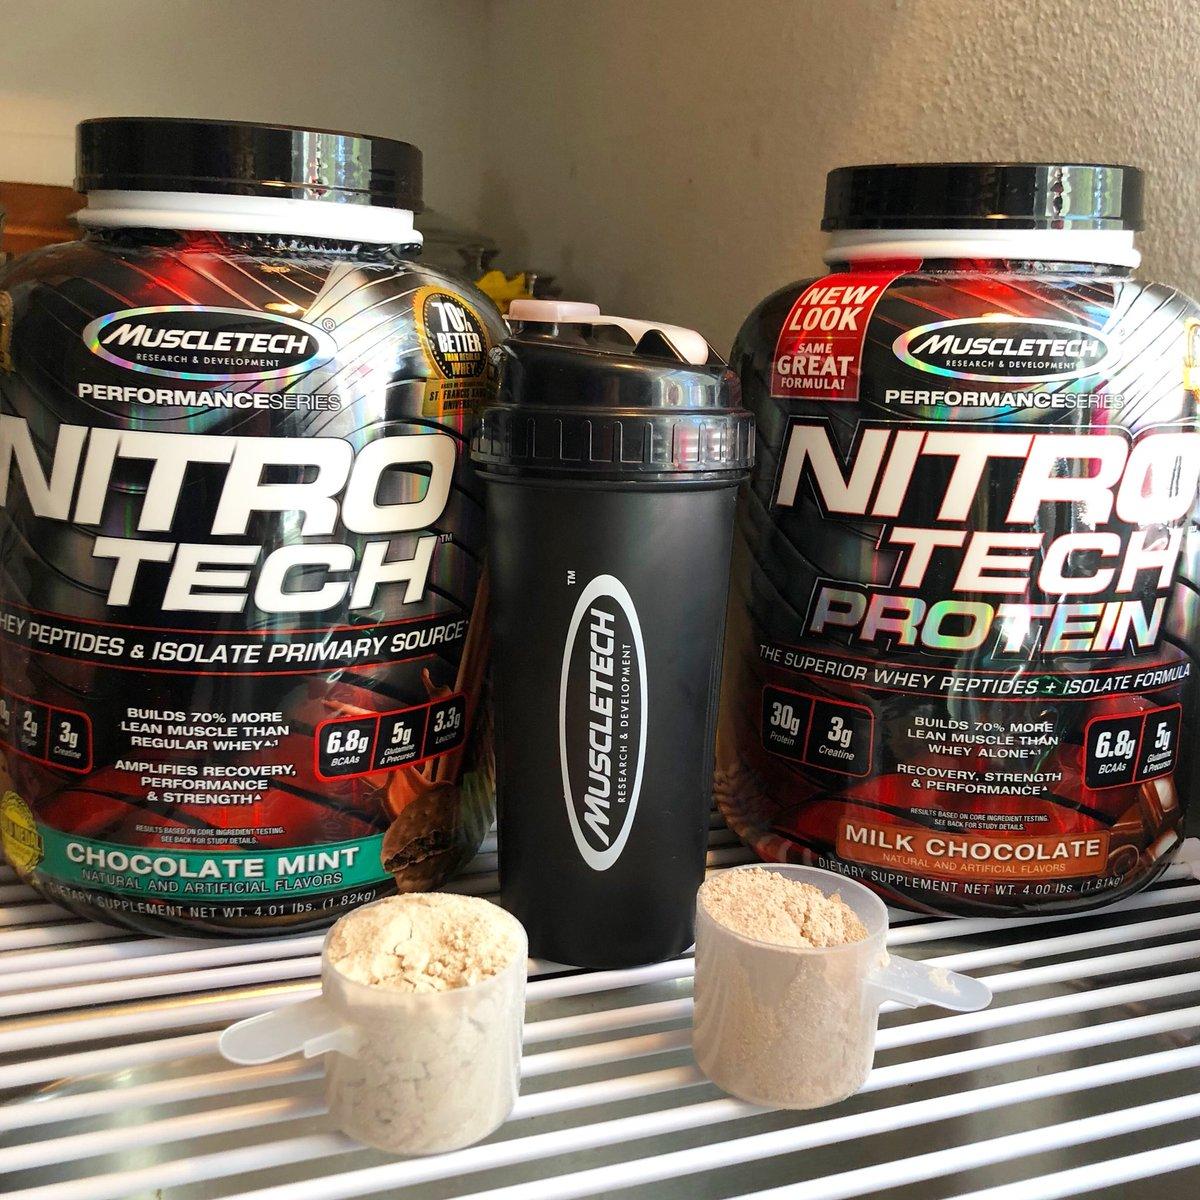 Nitrotech Hashtag On Twitter Muscletech Whey Gold 6 Lb Fridayfeels Teammuscletech Mtsponsor Sponsored Goals Alldayeveryday Dedicated Protein Leanmusclebuilder Fitfam